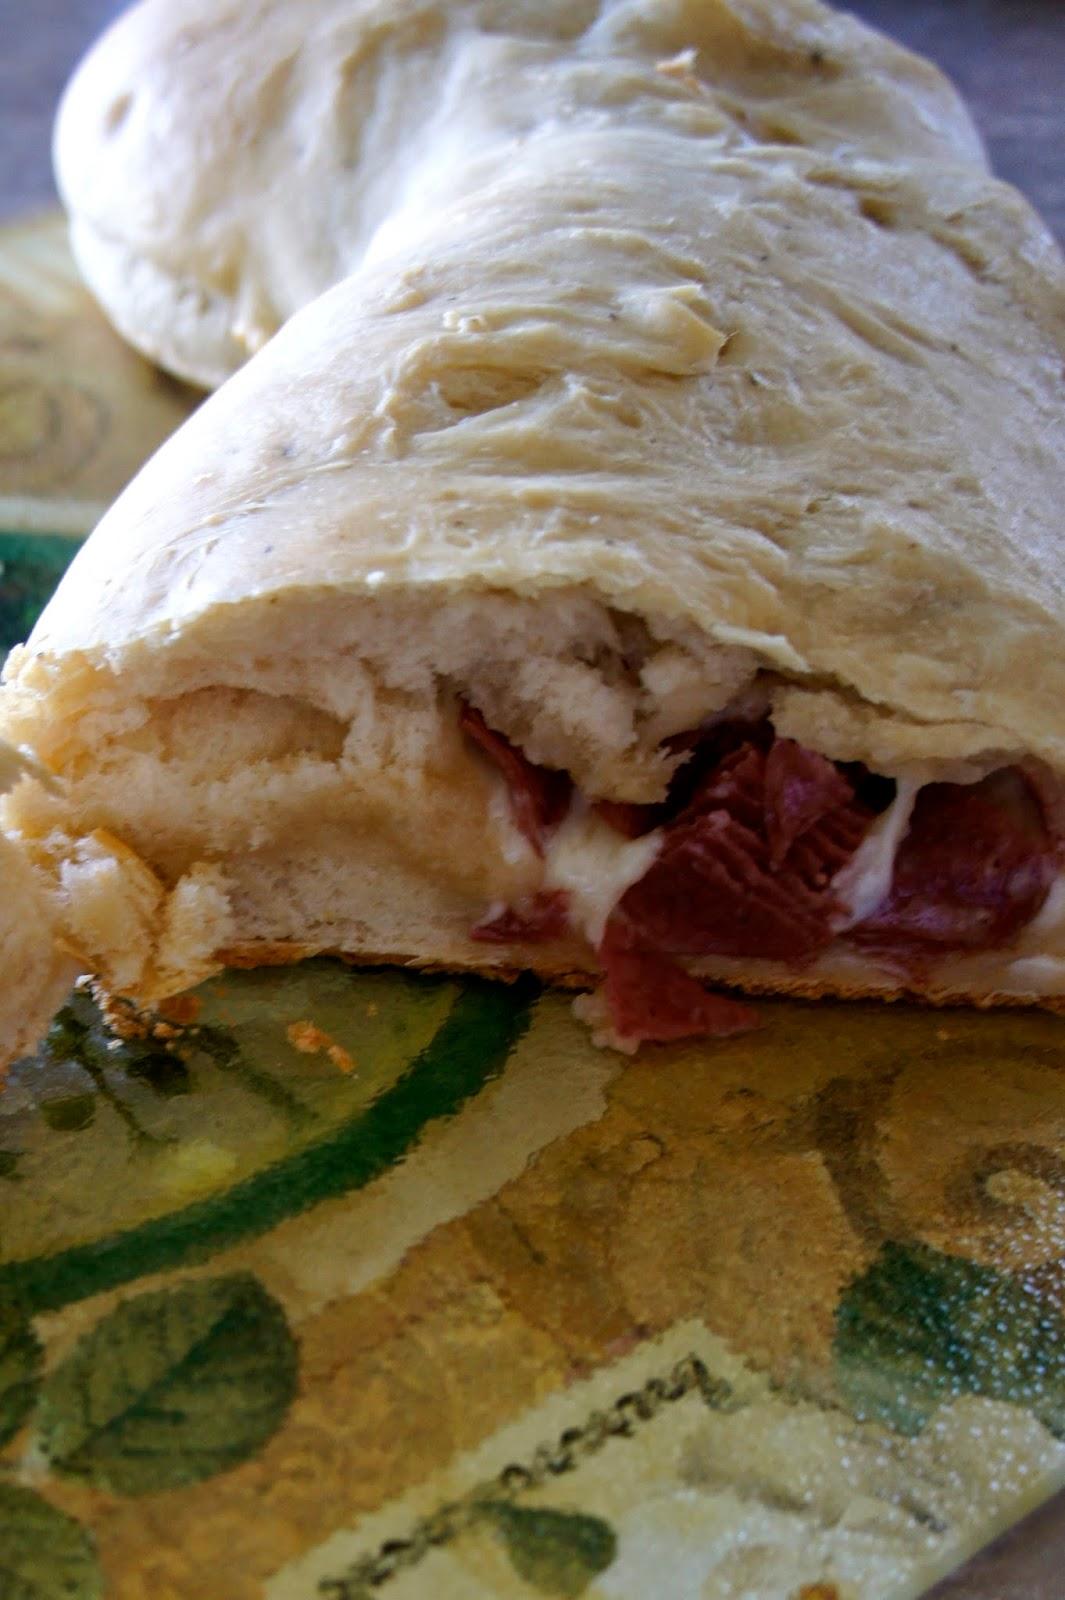 Stromboli: Savory Sweet and Satisfying